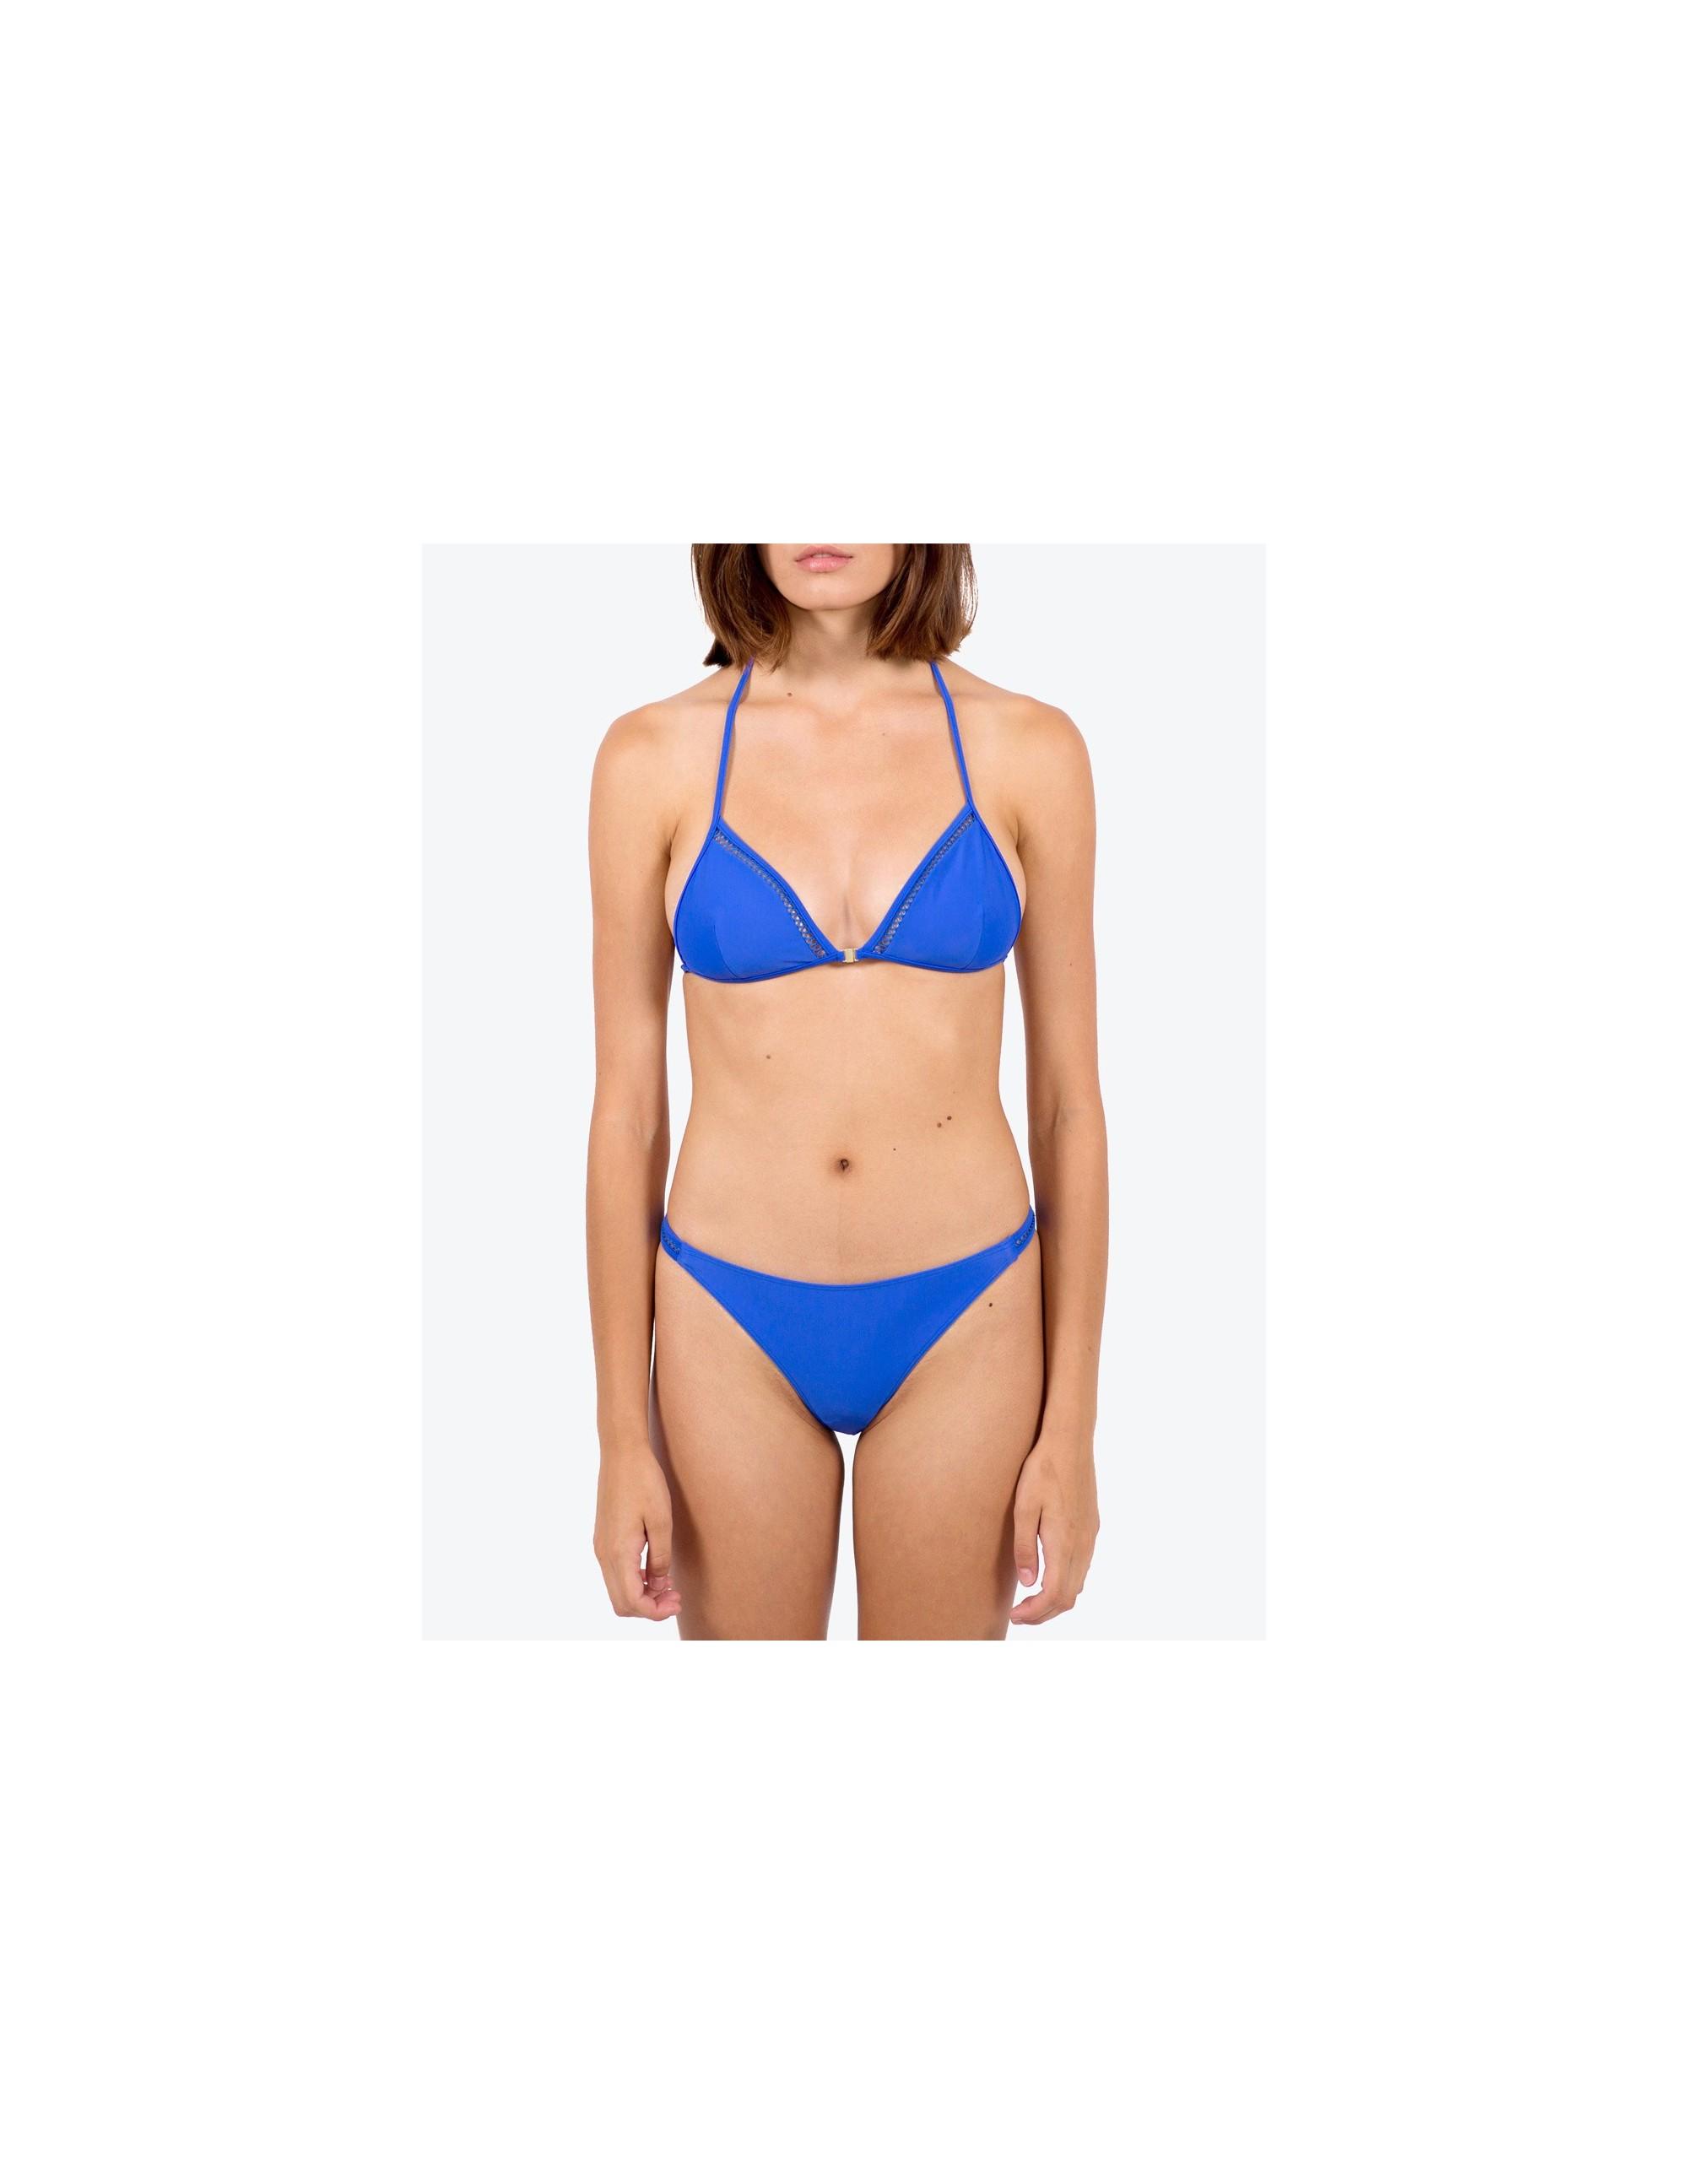 ANAMUR bikini bottom - ECHO BLUE